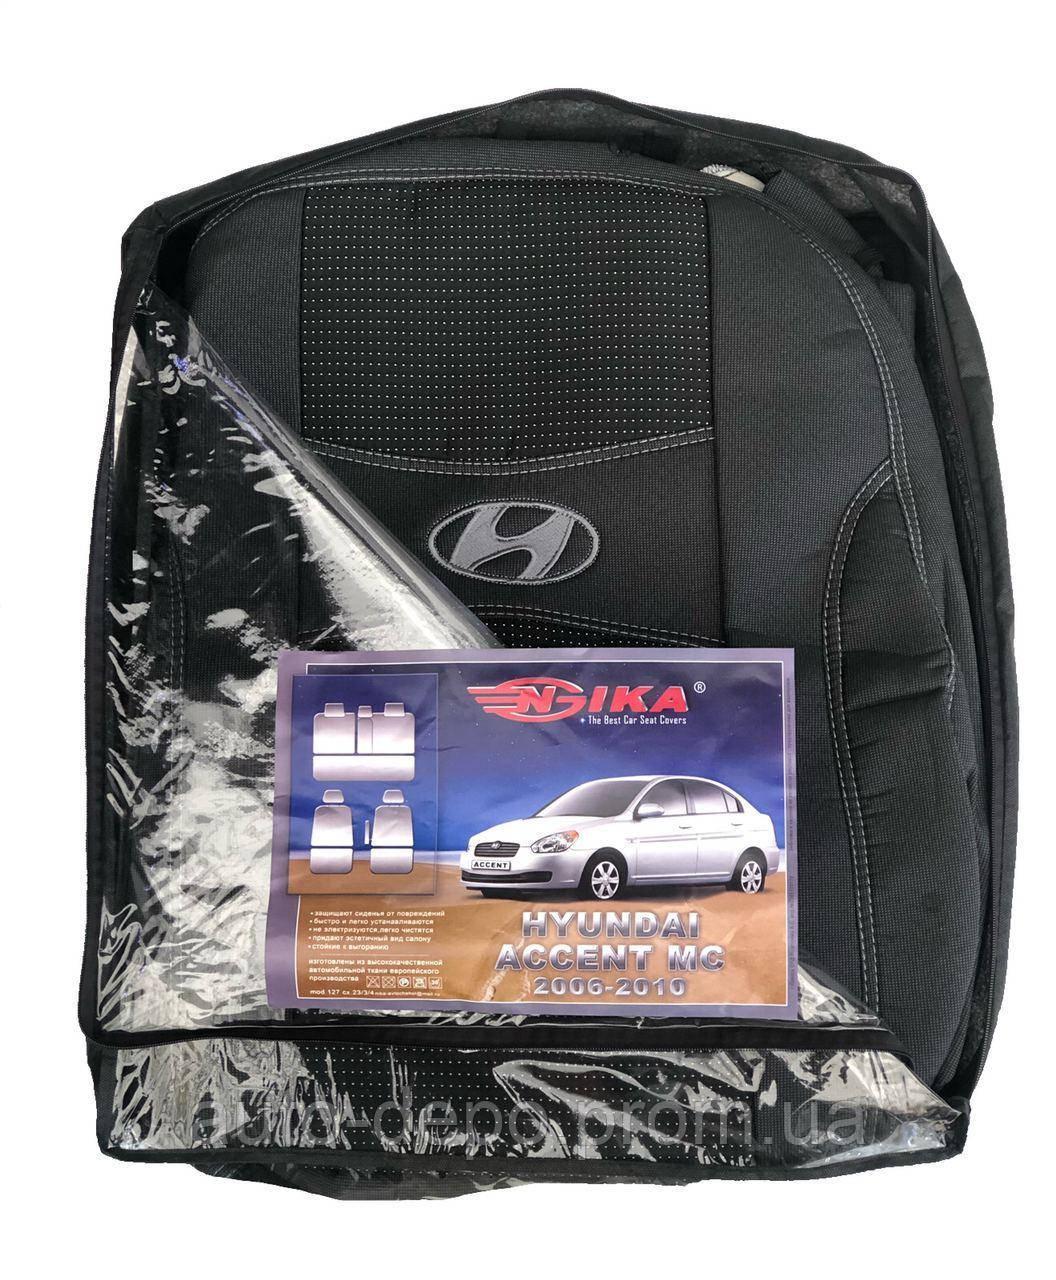 Чехлы на сиденья Хундай Акцент Hyundai Accent MC 2006-2010 Nika